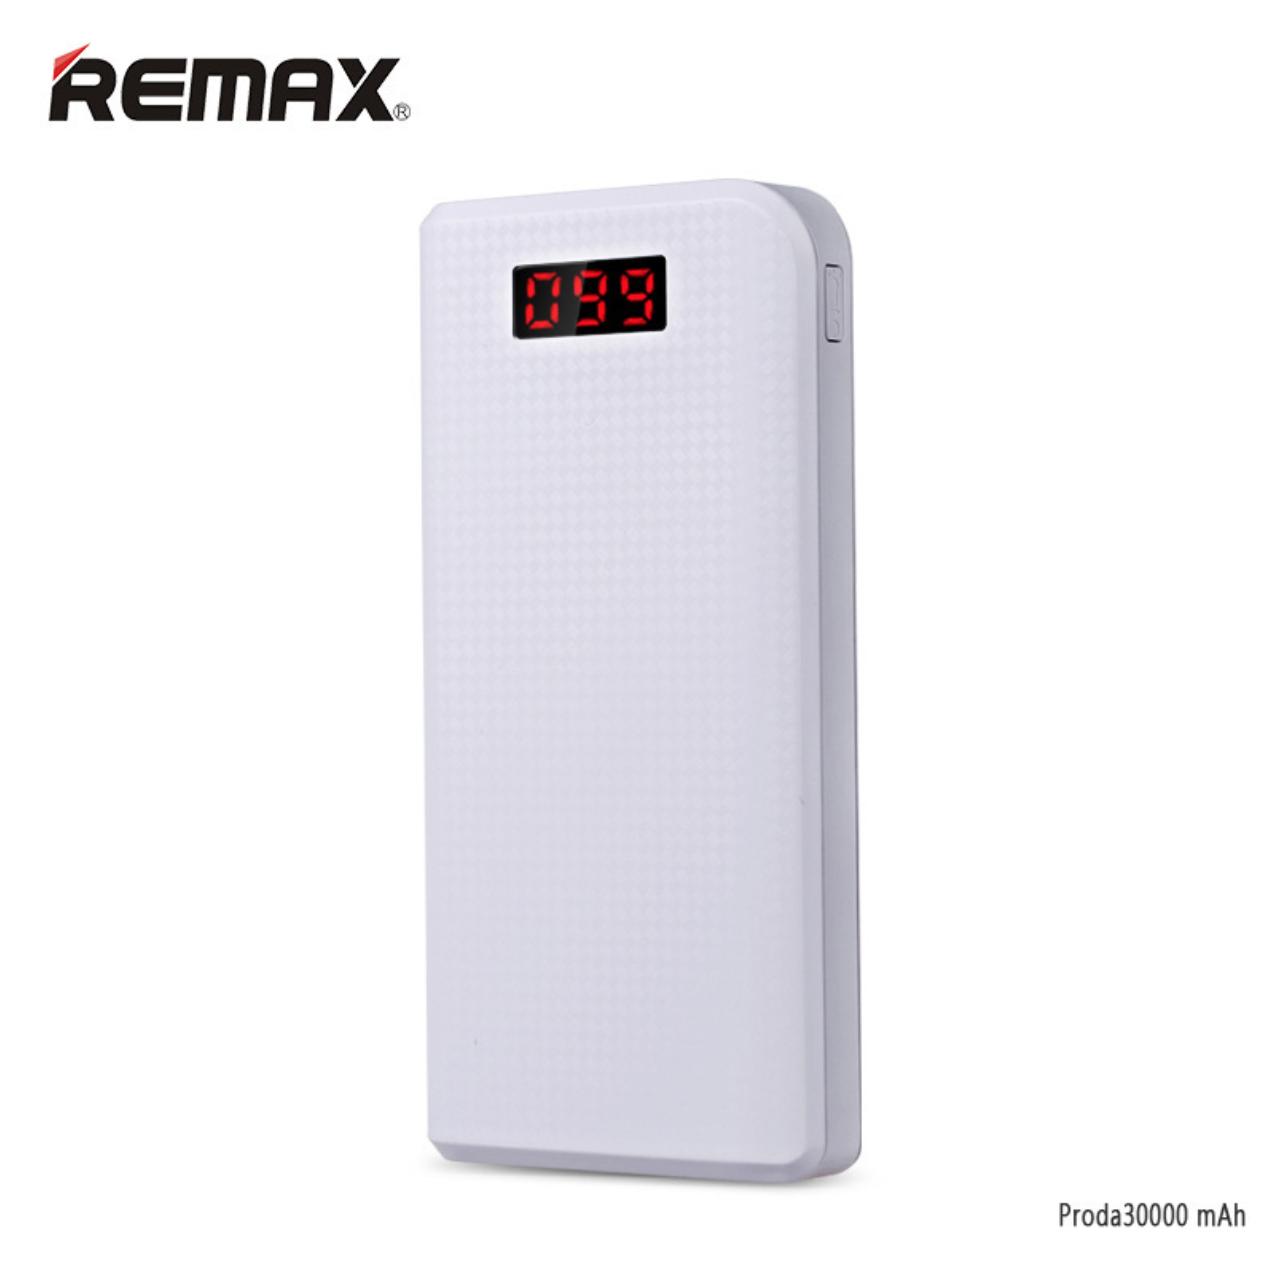 Повербанк Remax Proda 30000 mAh, Power bank, аккумулятор